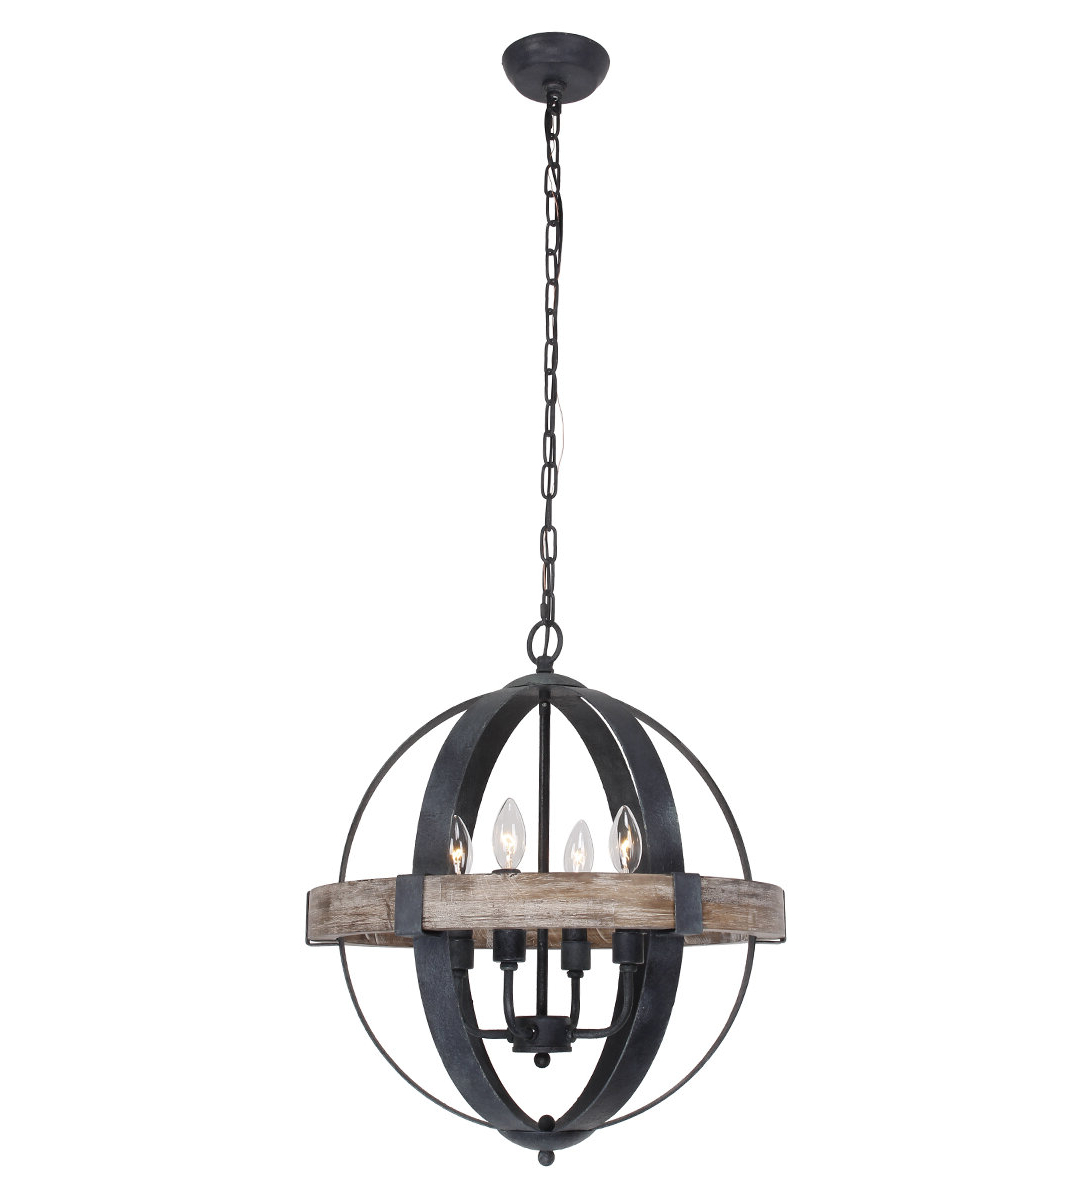 Widely Used La Sarre 3 Light Globe Chandeliers With Hillsboro 4 Light Globe Chandelier (View 21 of 25)